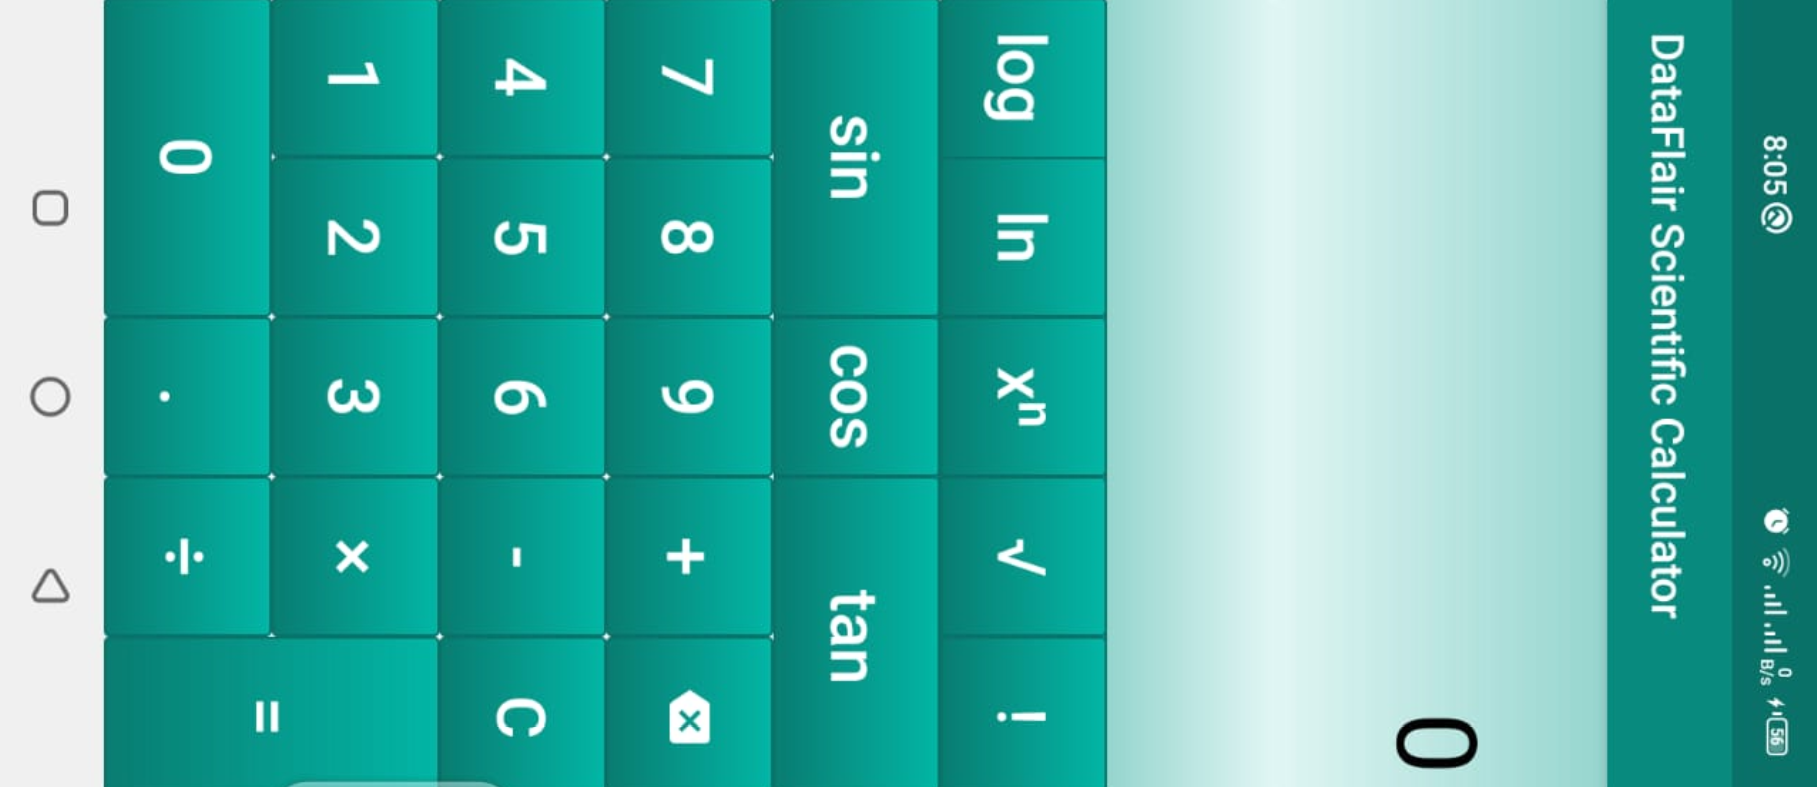 Golf Scientific Calculator